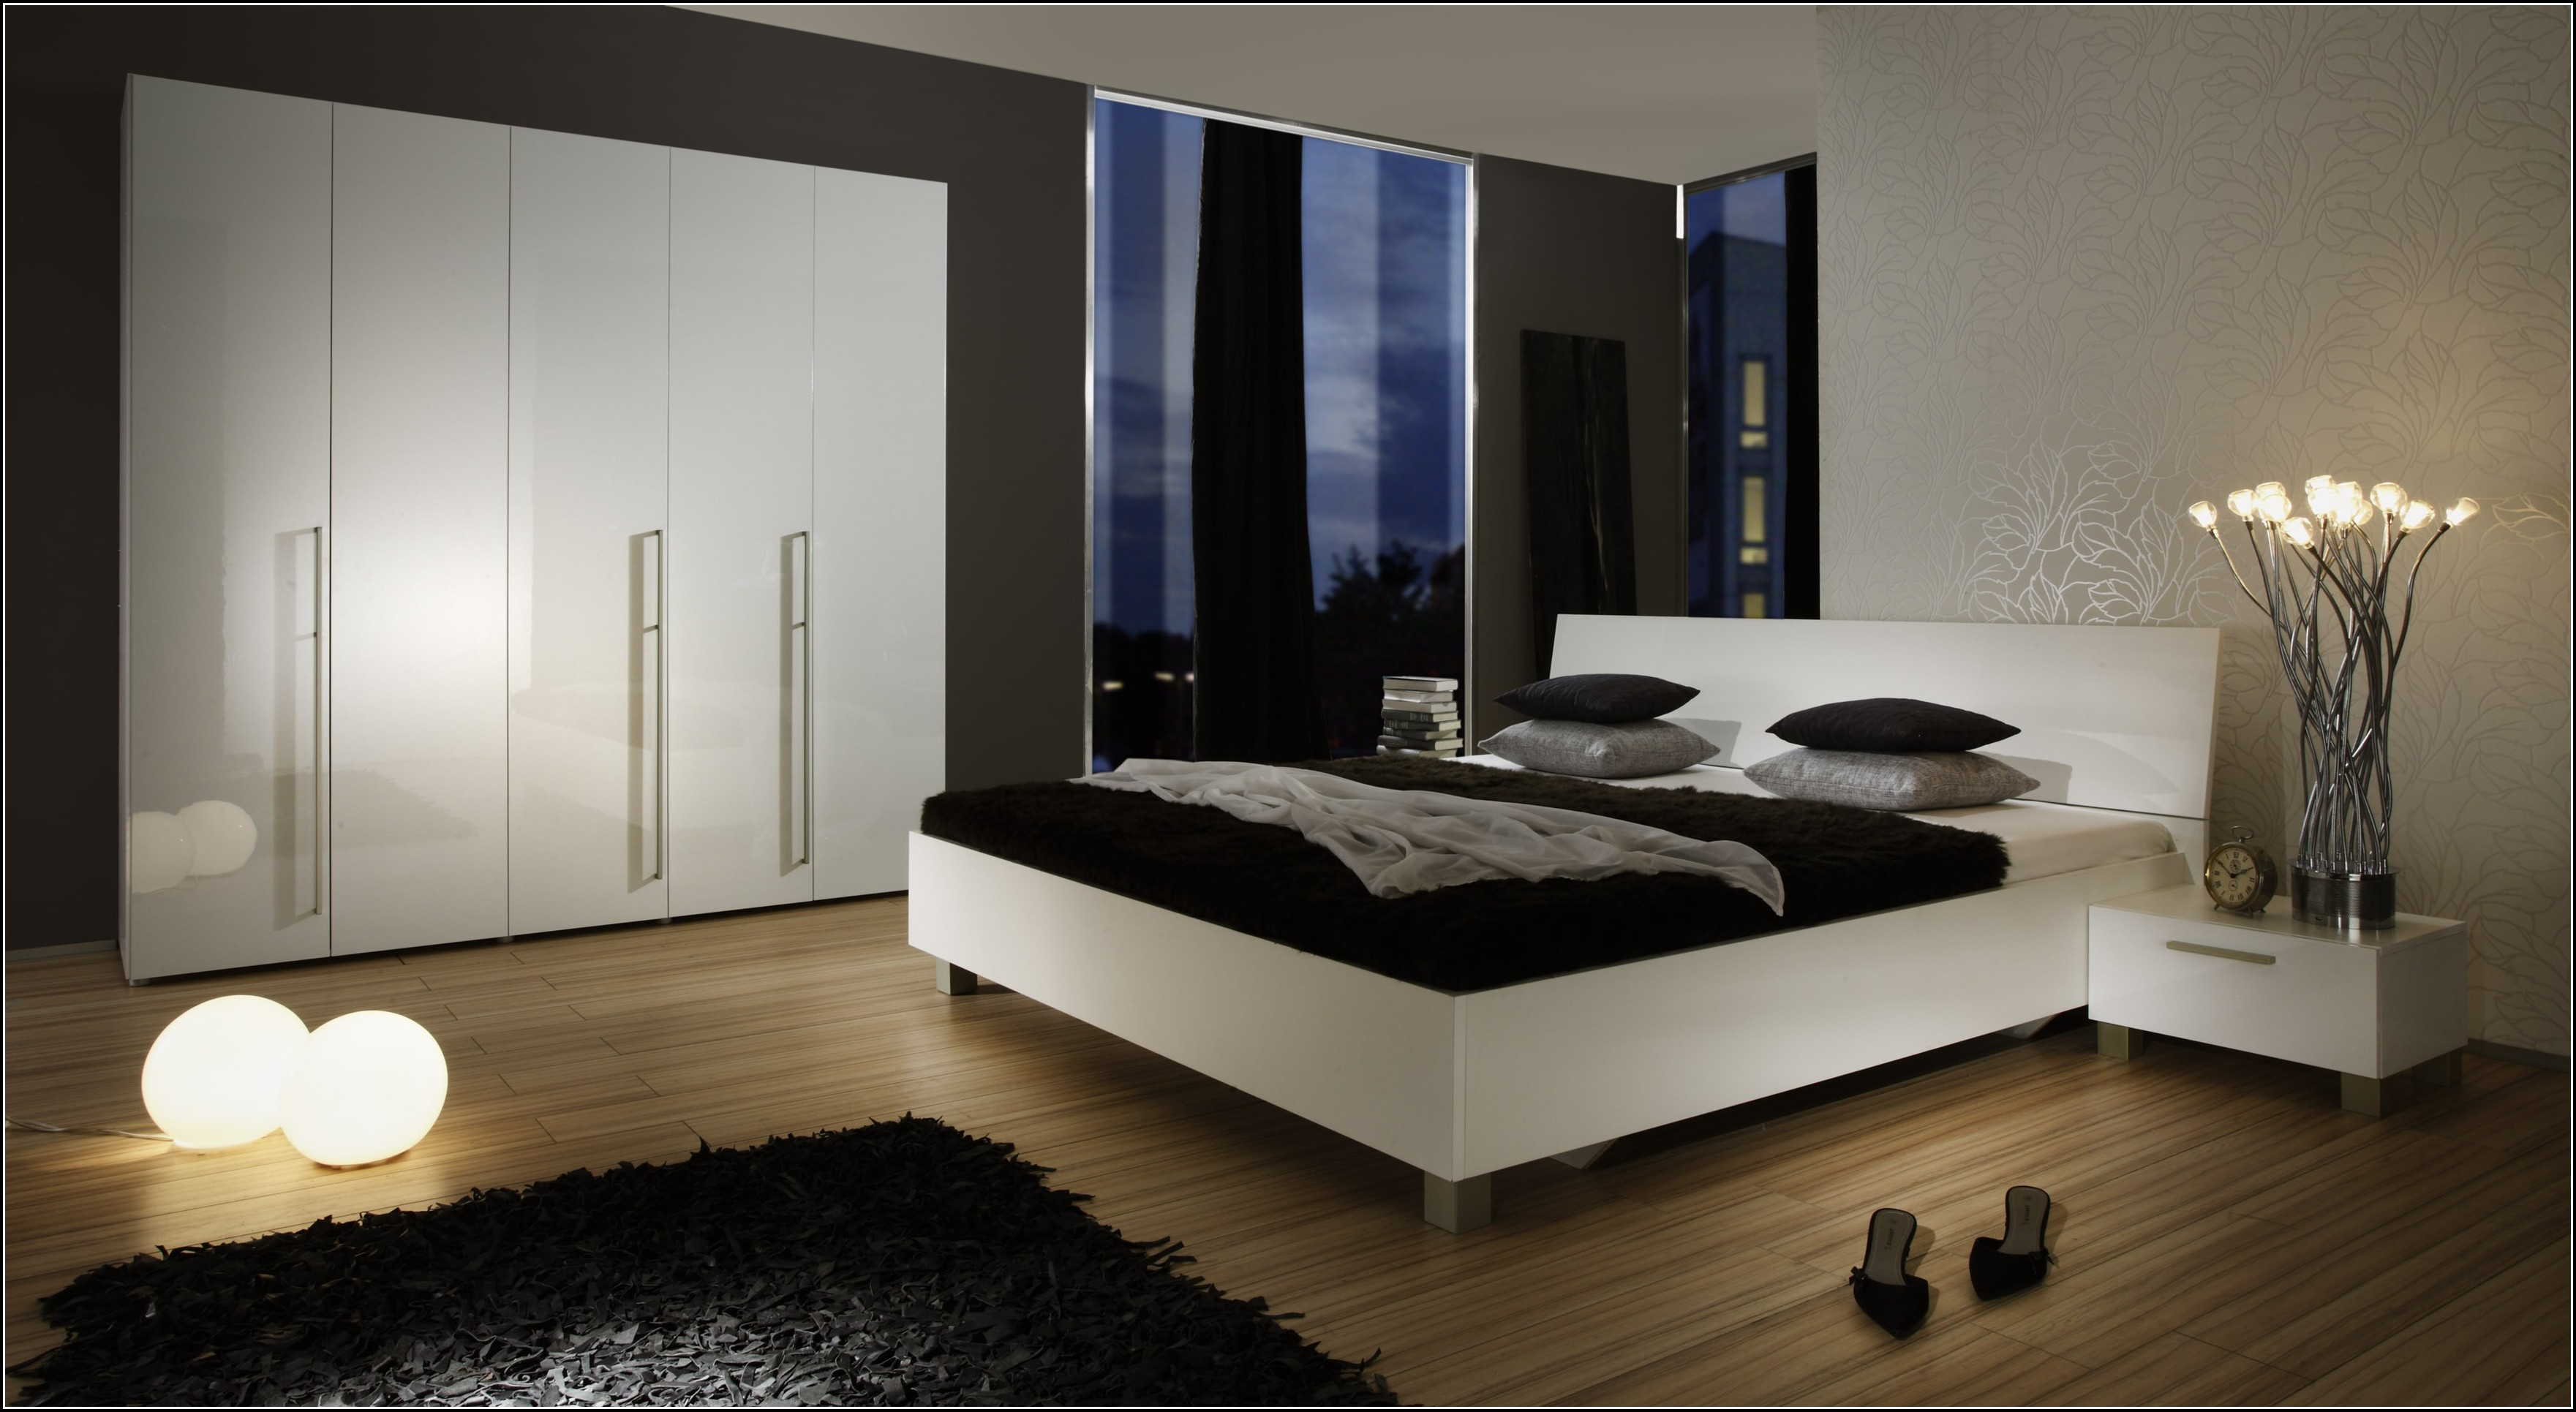 Komplett schlafzimmer 140x200 bett schlafzimmerm bel schlafzimmer house und dekor galerie - Schlafzimmer komplett 140x200 ...